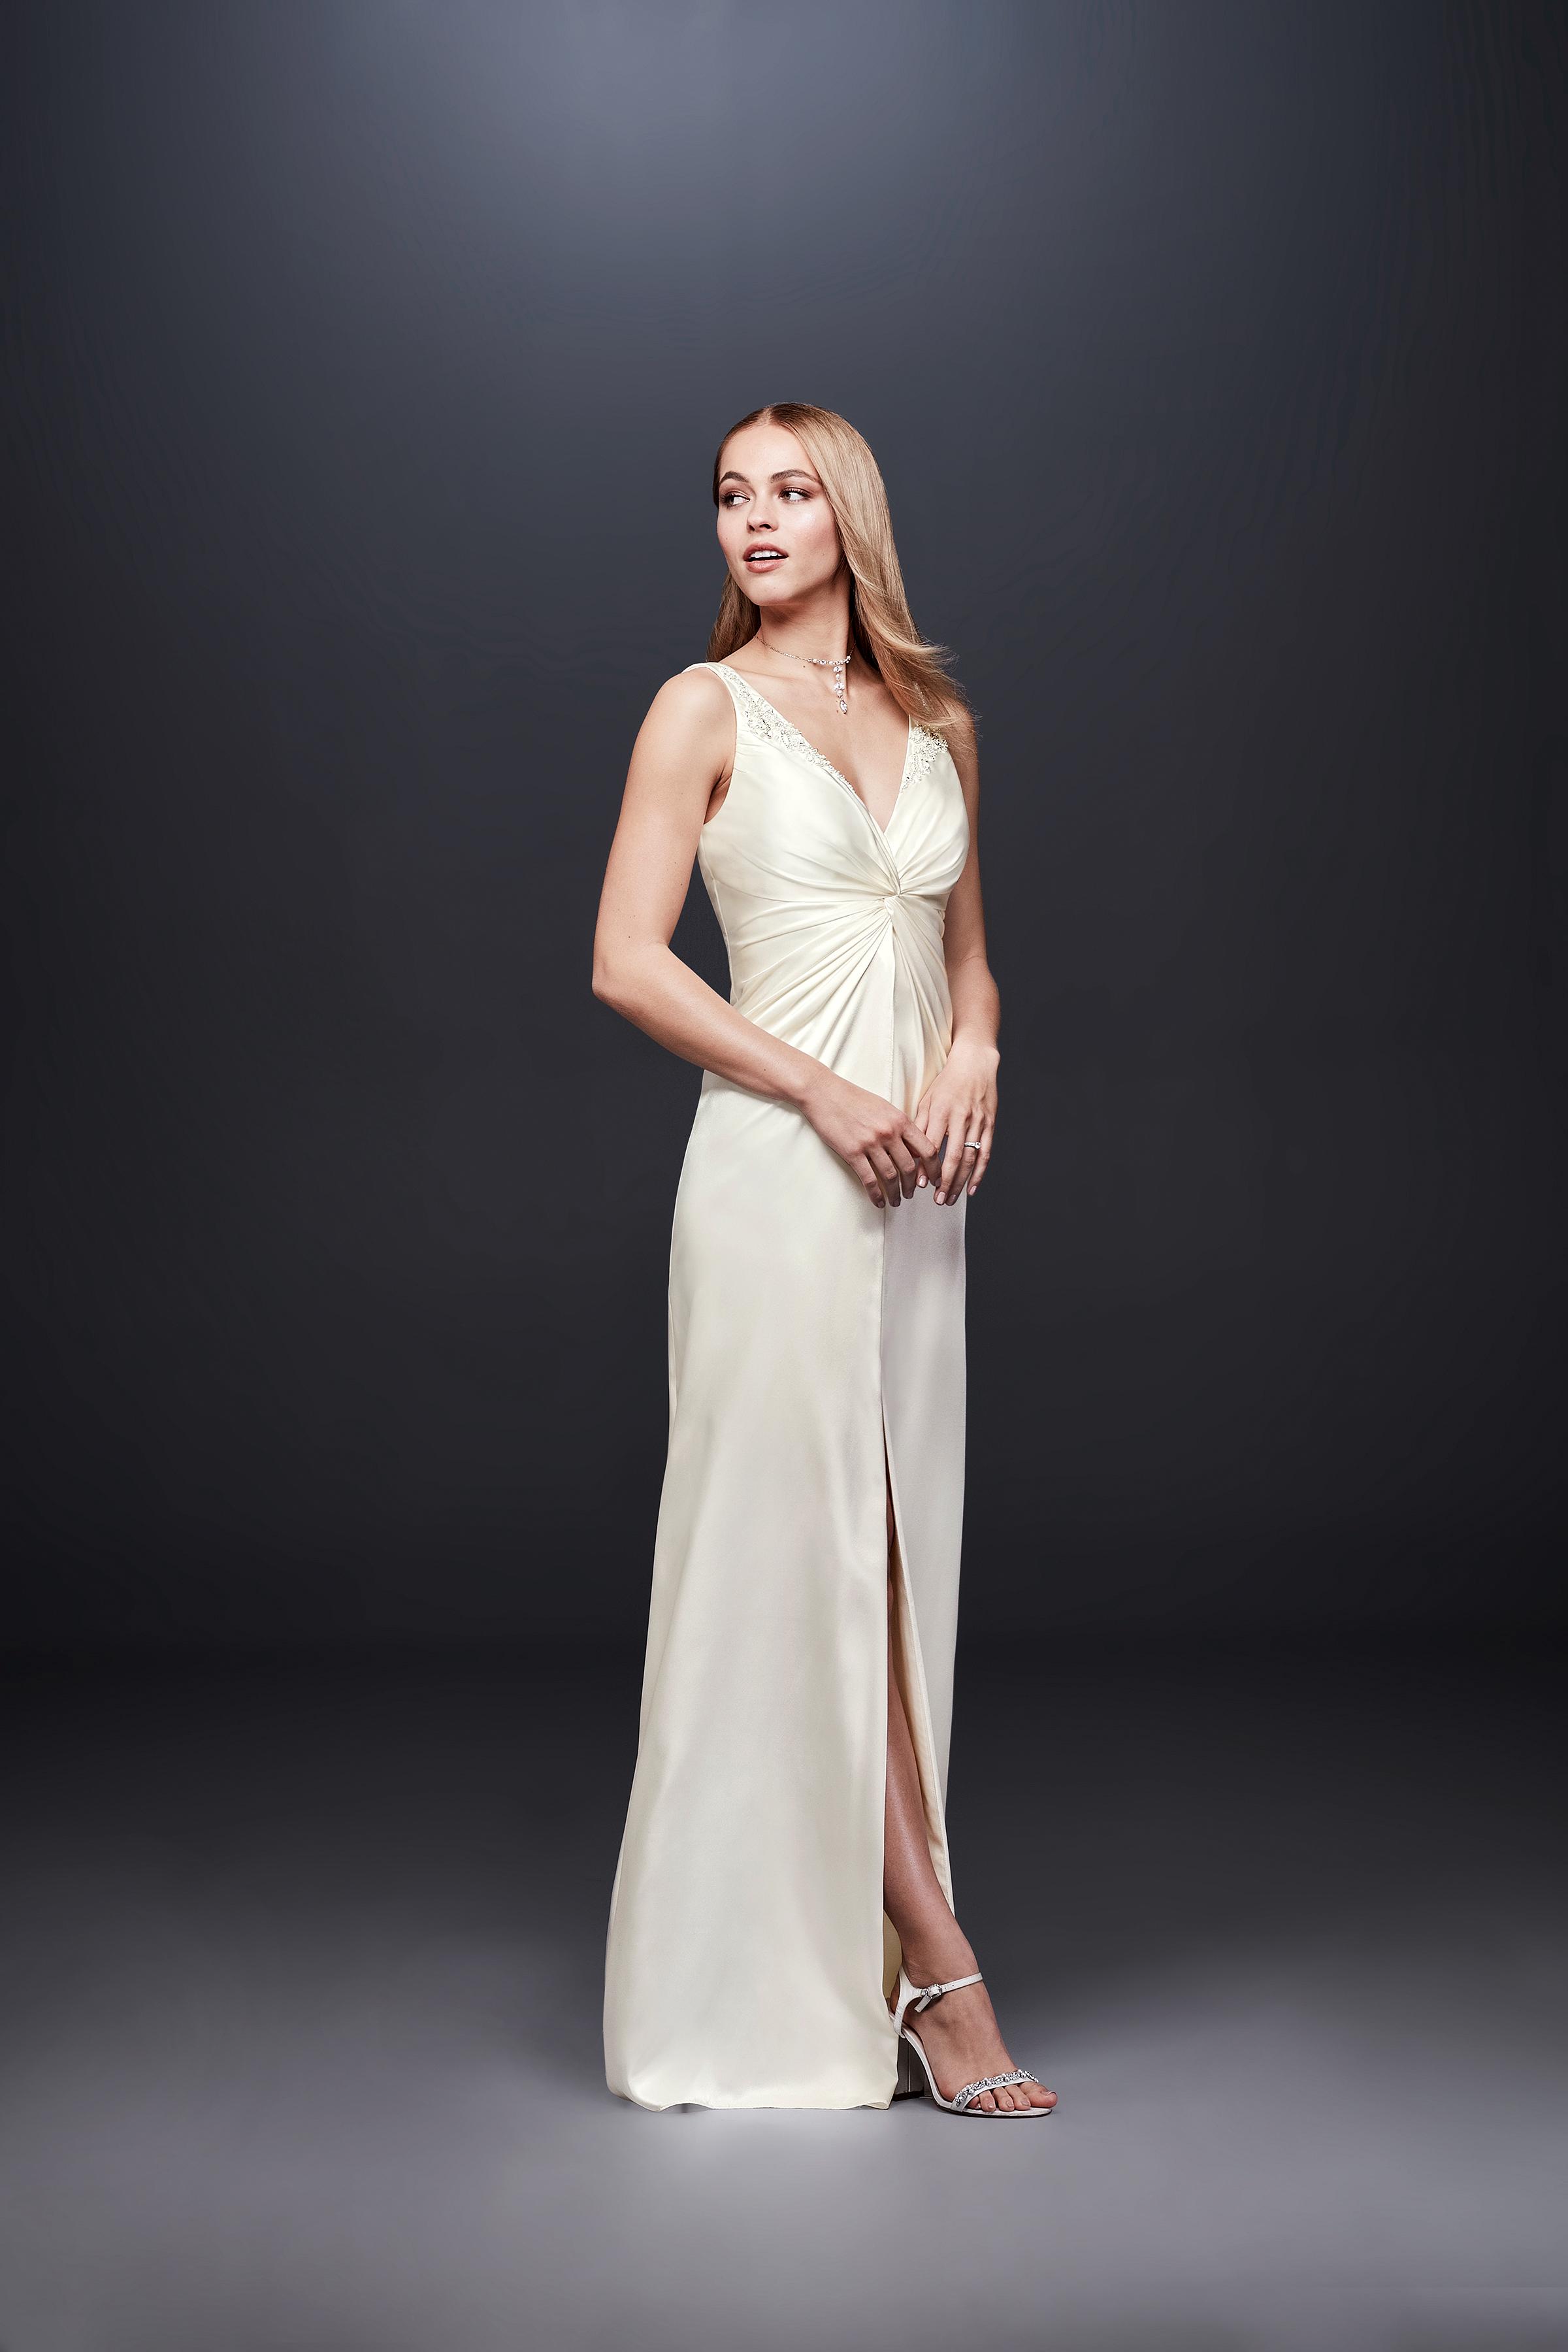 david bridal wedding dress spring 2019 v-neck sleeveless satin